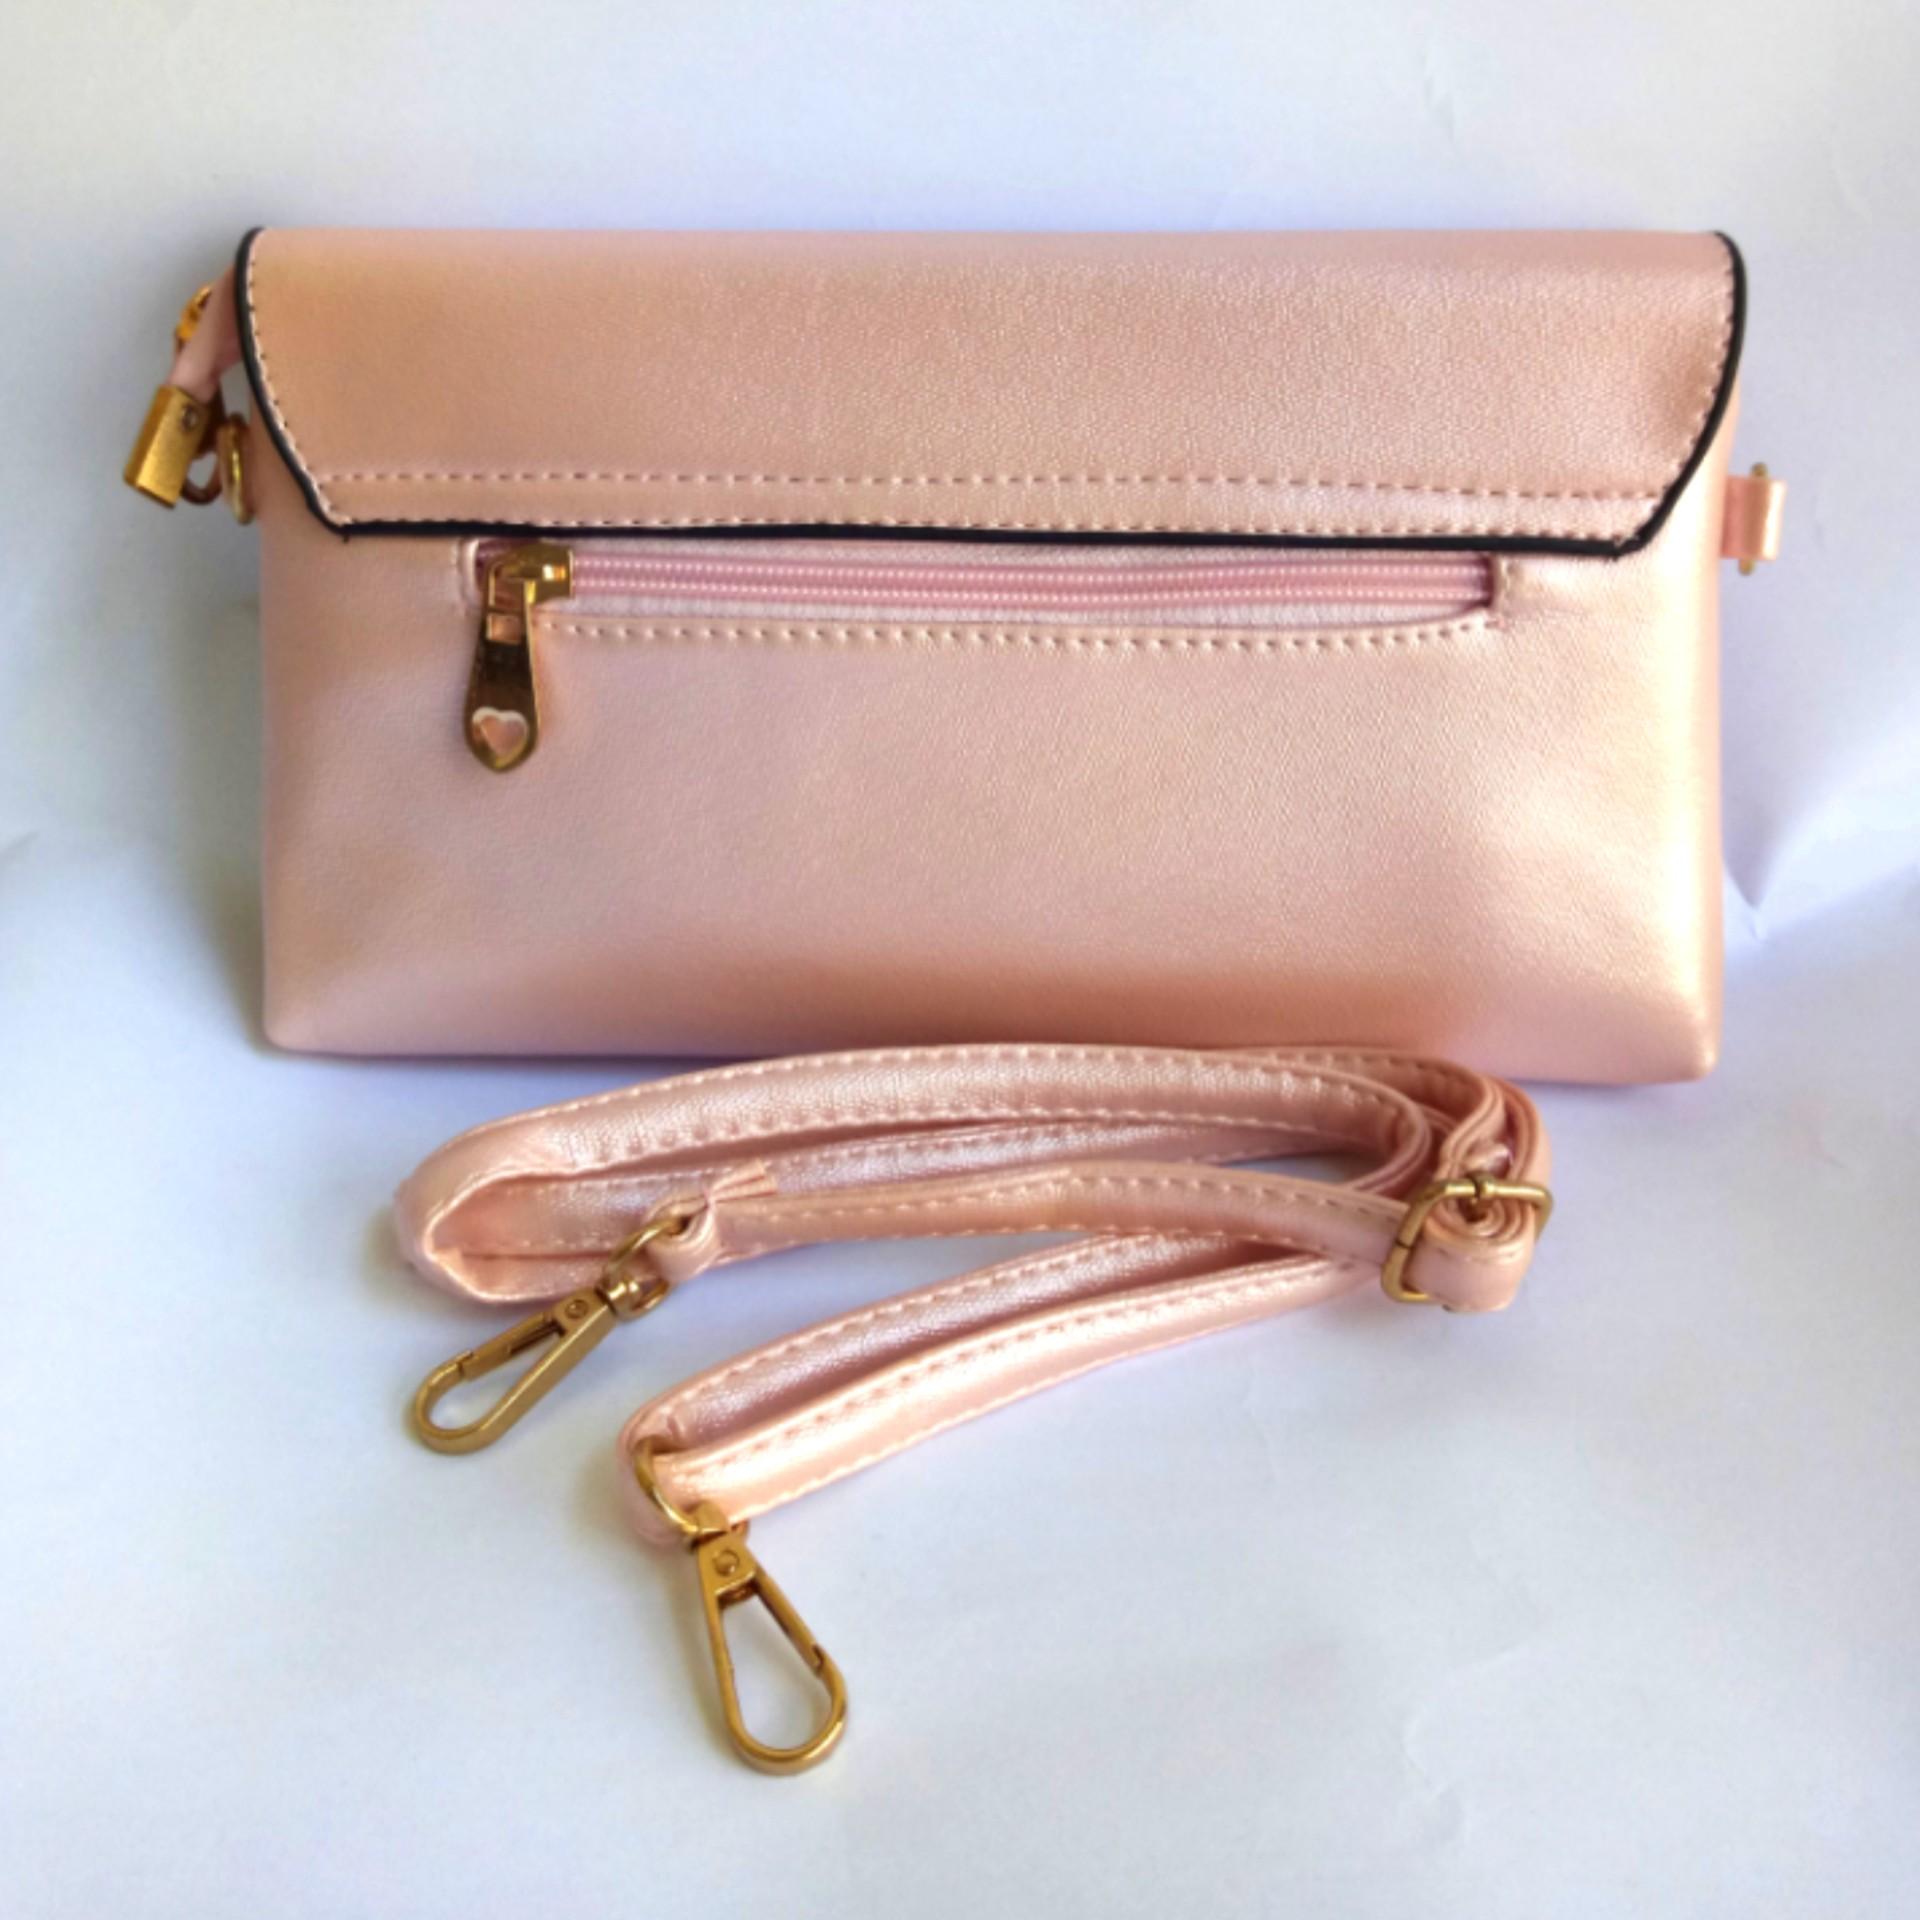 ec688f07092d Elegant leather sling bag